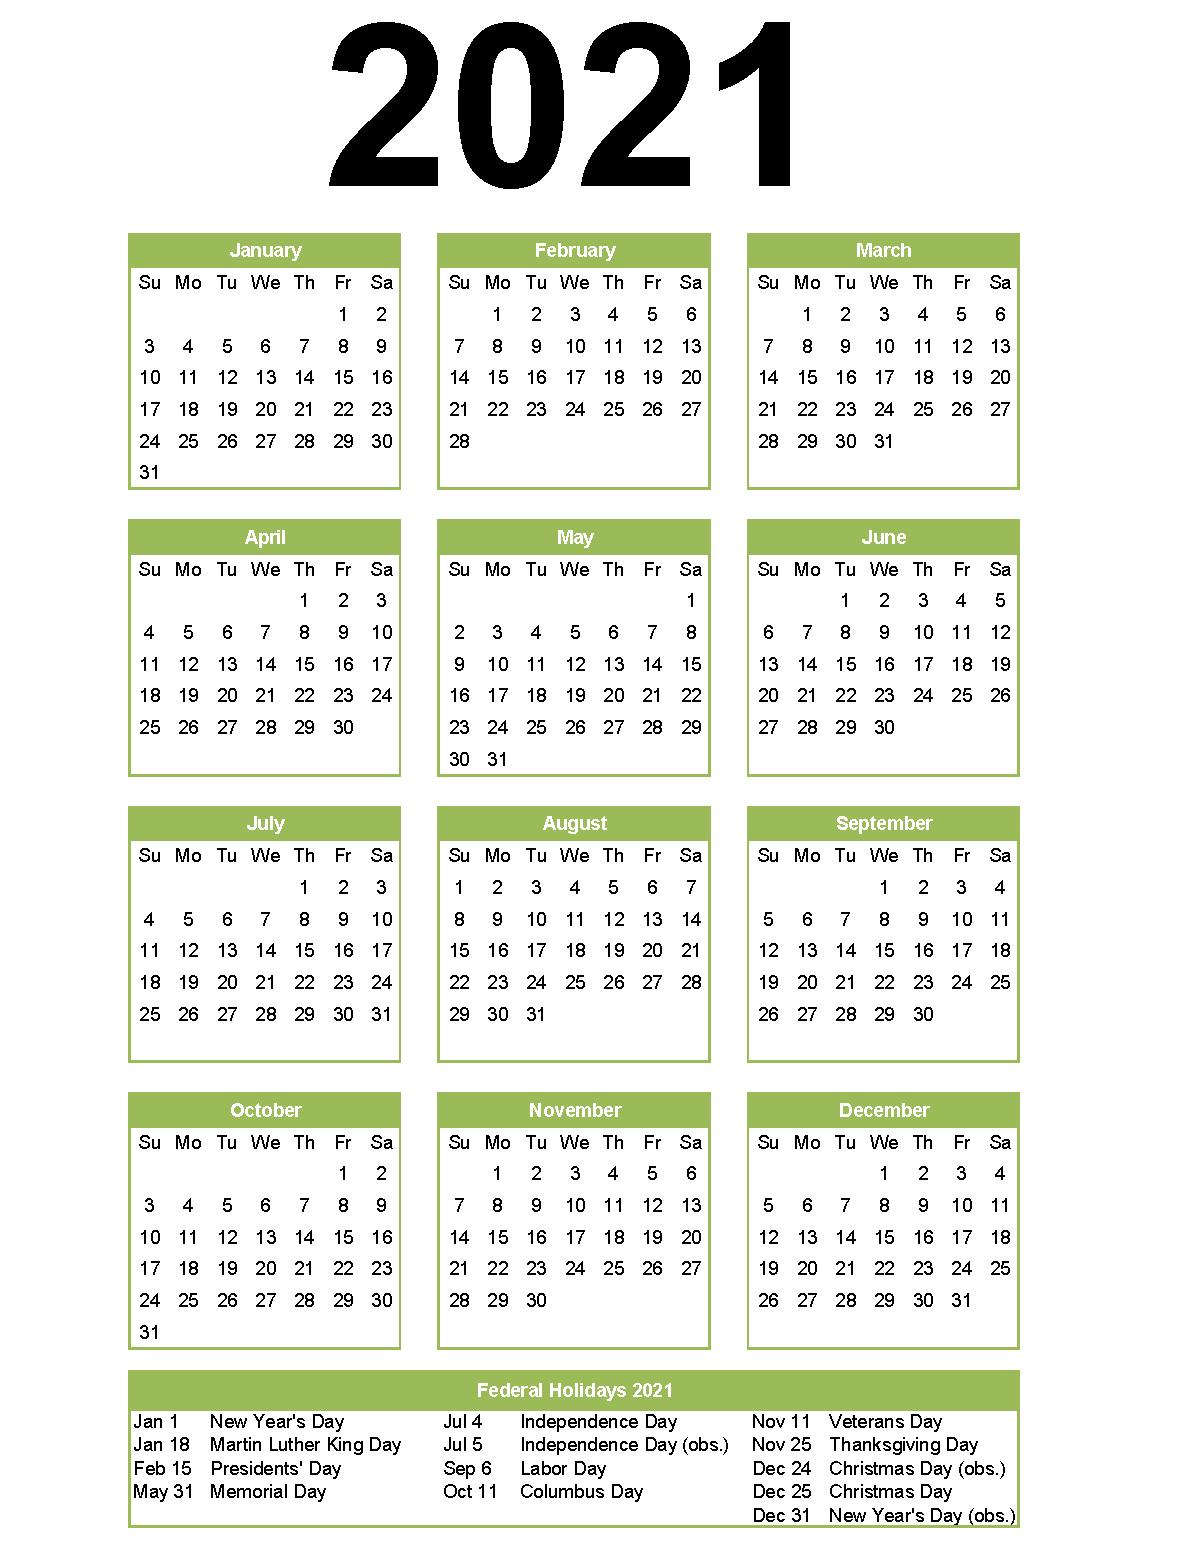 2021 Portrait Holidays Calendar